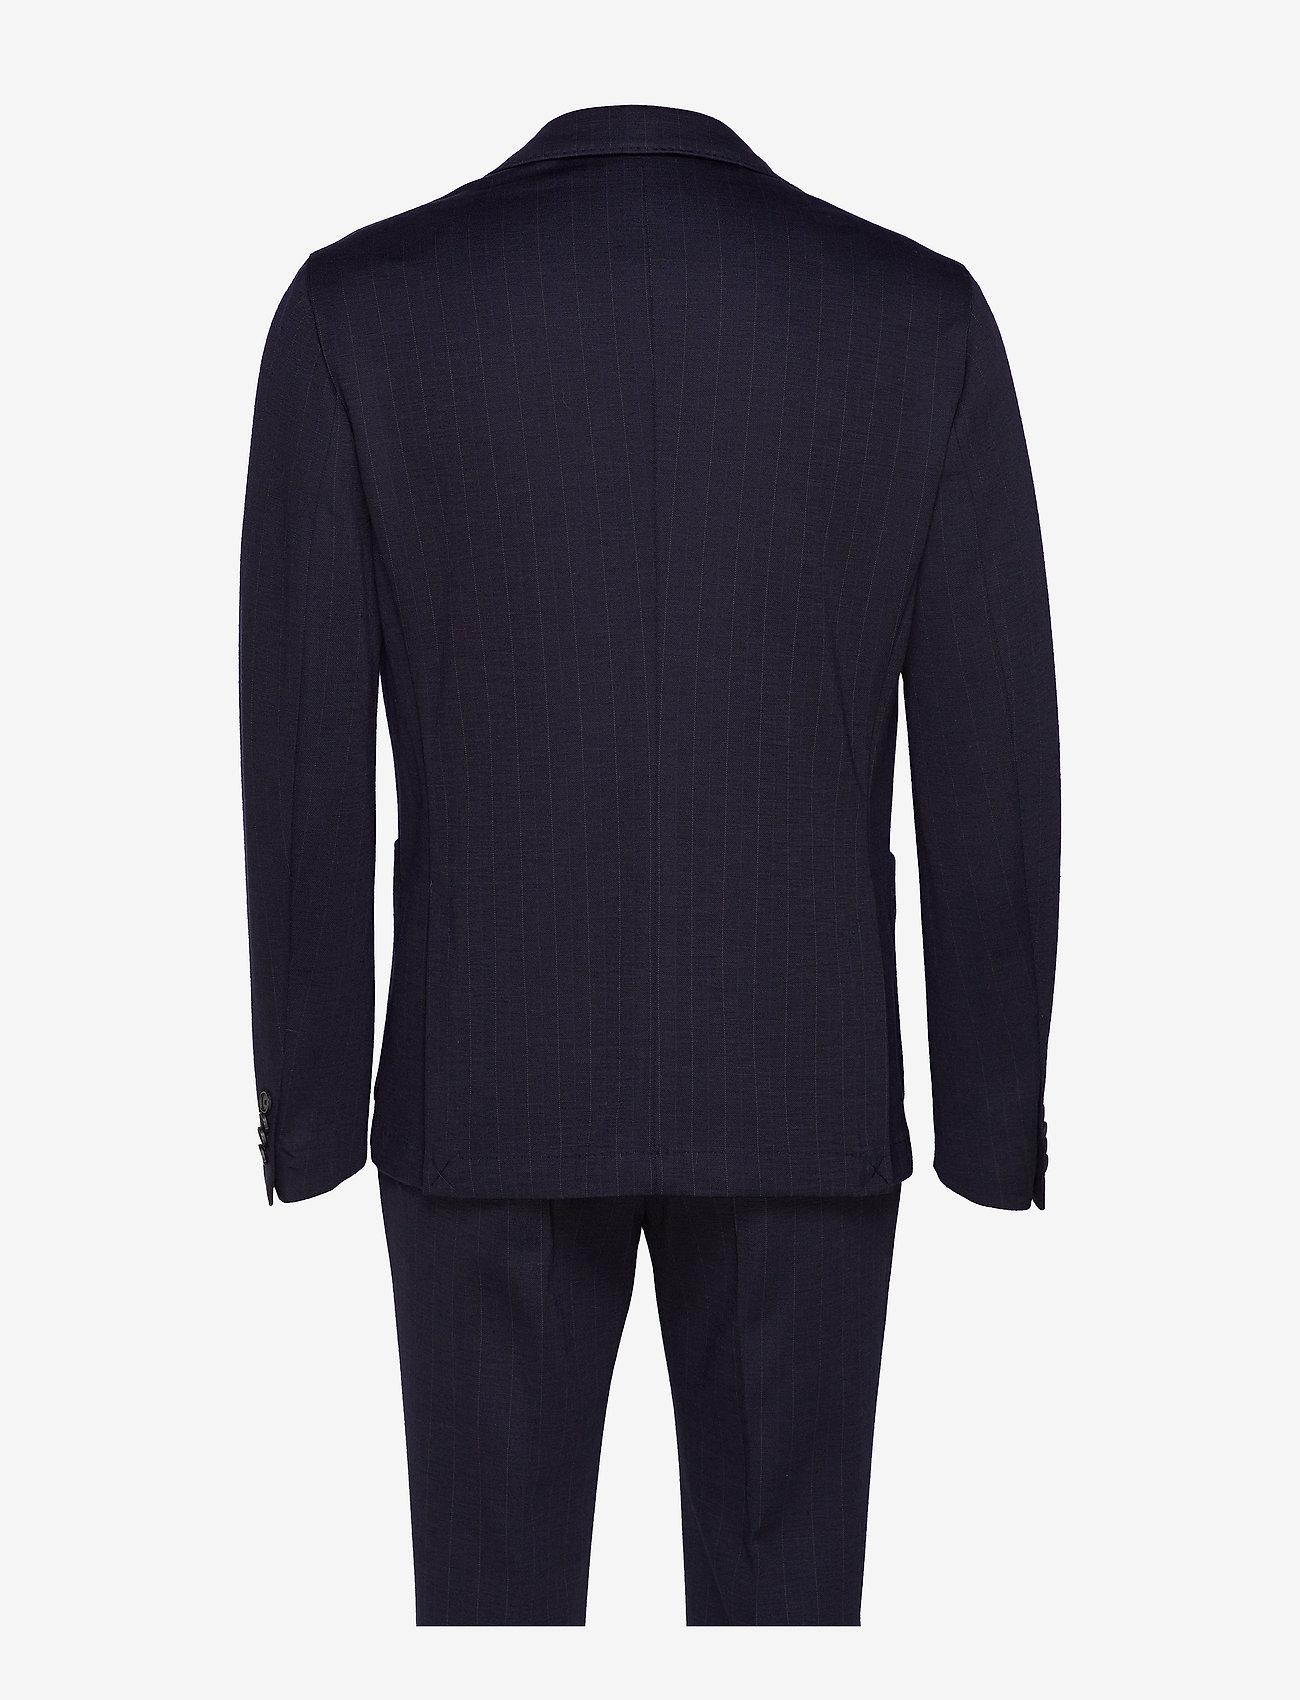 Tommy Hilfiger Tailored - PACKABLE SLIM FLEX STRIPE SUIT - kombinezony jednorzędowe - dessert sky/blue - 1